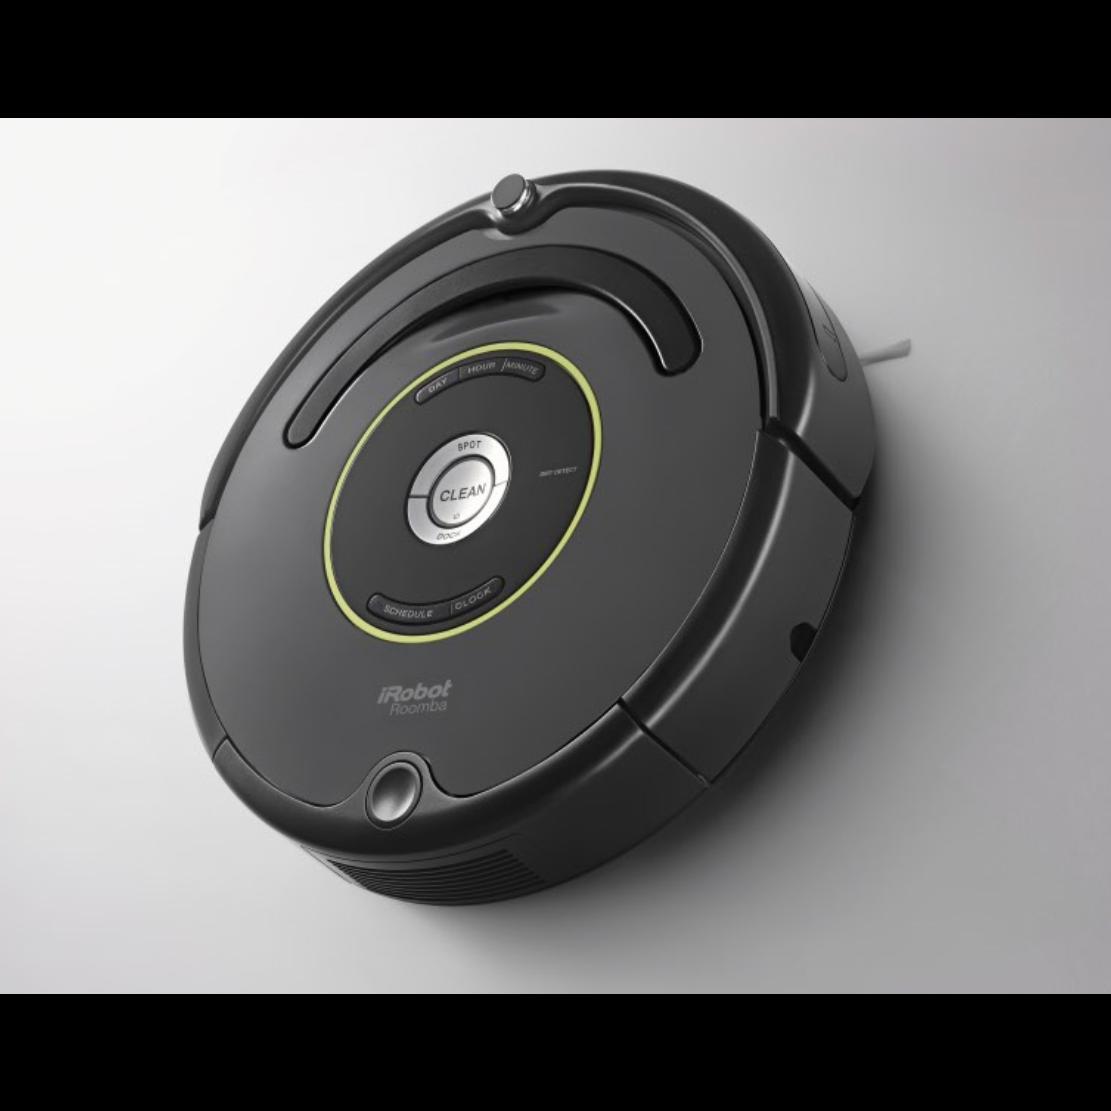 aspirateur robot irobot roomba 651 bestofrobots. Black Bedroom Furniture Sets. Home Design Ideas